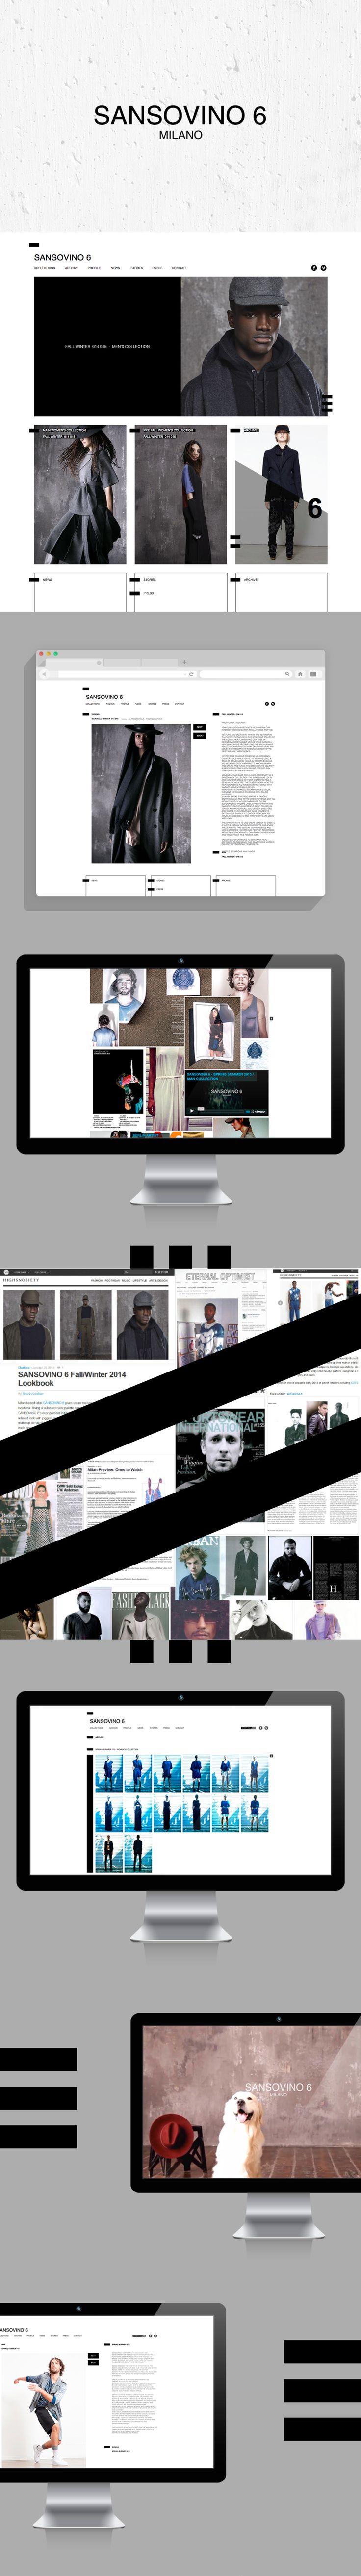 SANSOVINO 6 / Web Design 2014 DESIGN BY HOUKART  www.houkart.com #Design #Houkart #Web #SANSOVINO6 #Milan #THESITUATION www.sansovino6.it